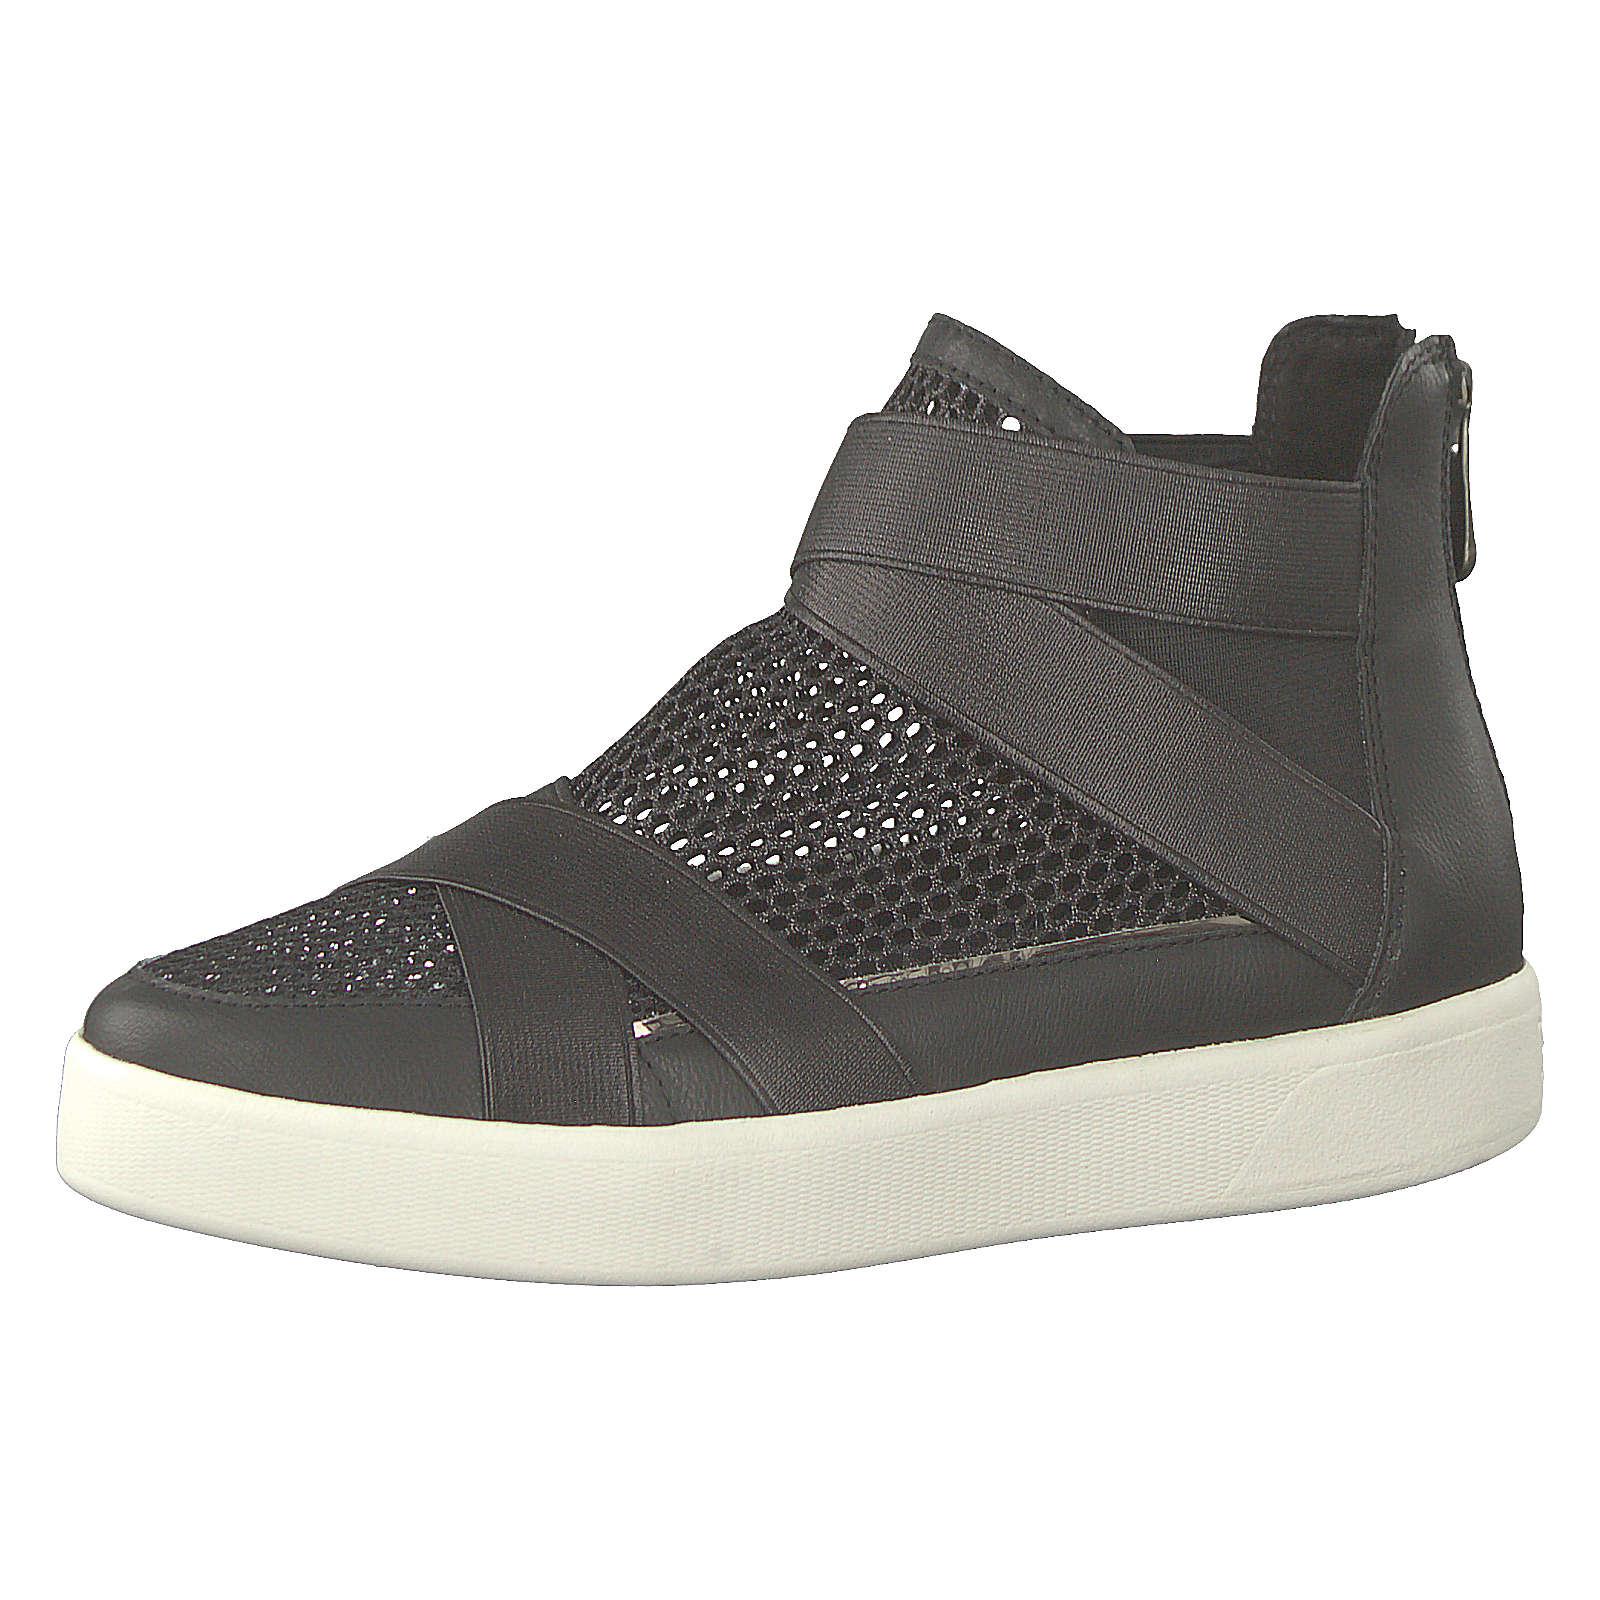 MARCO TOZZI Sneakers High schwarz Damen Gr. 39